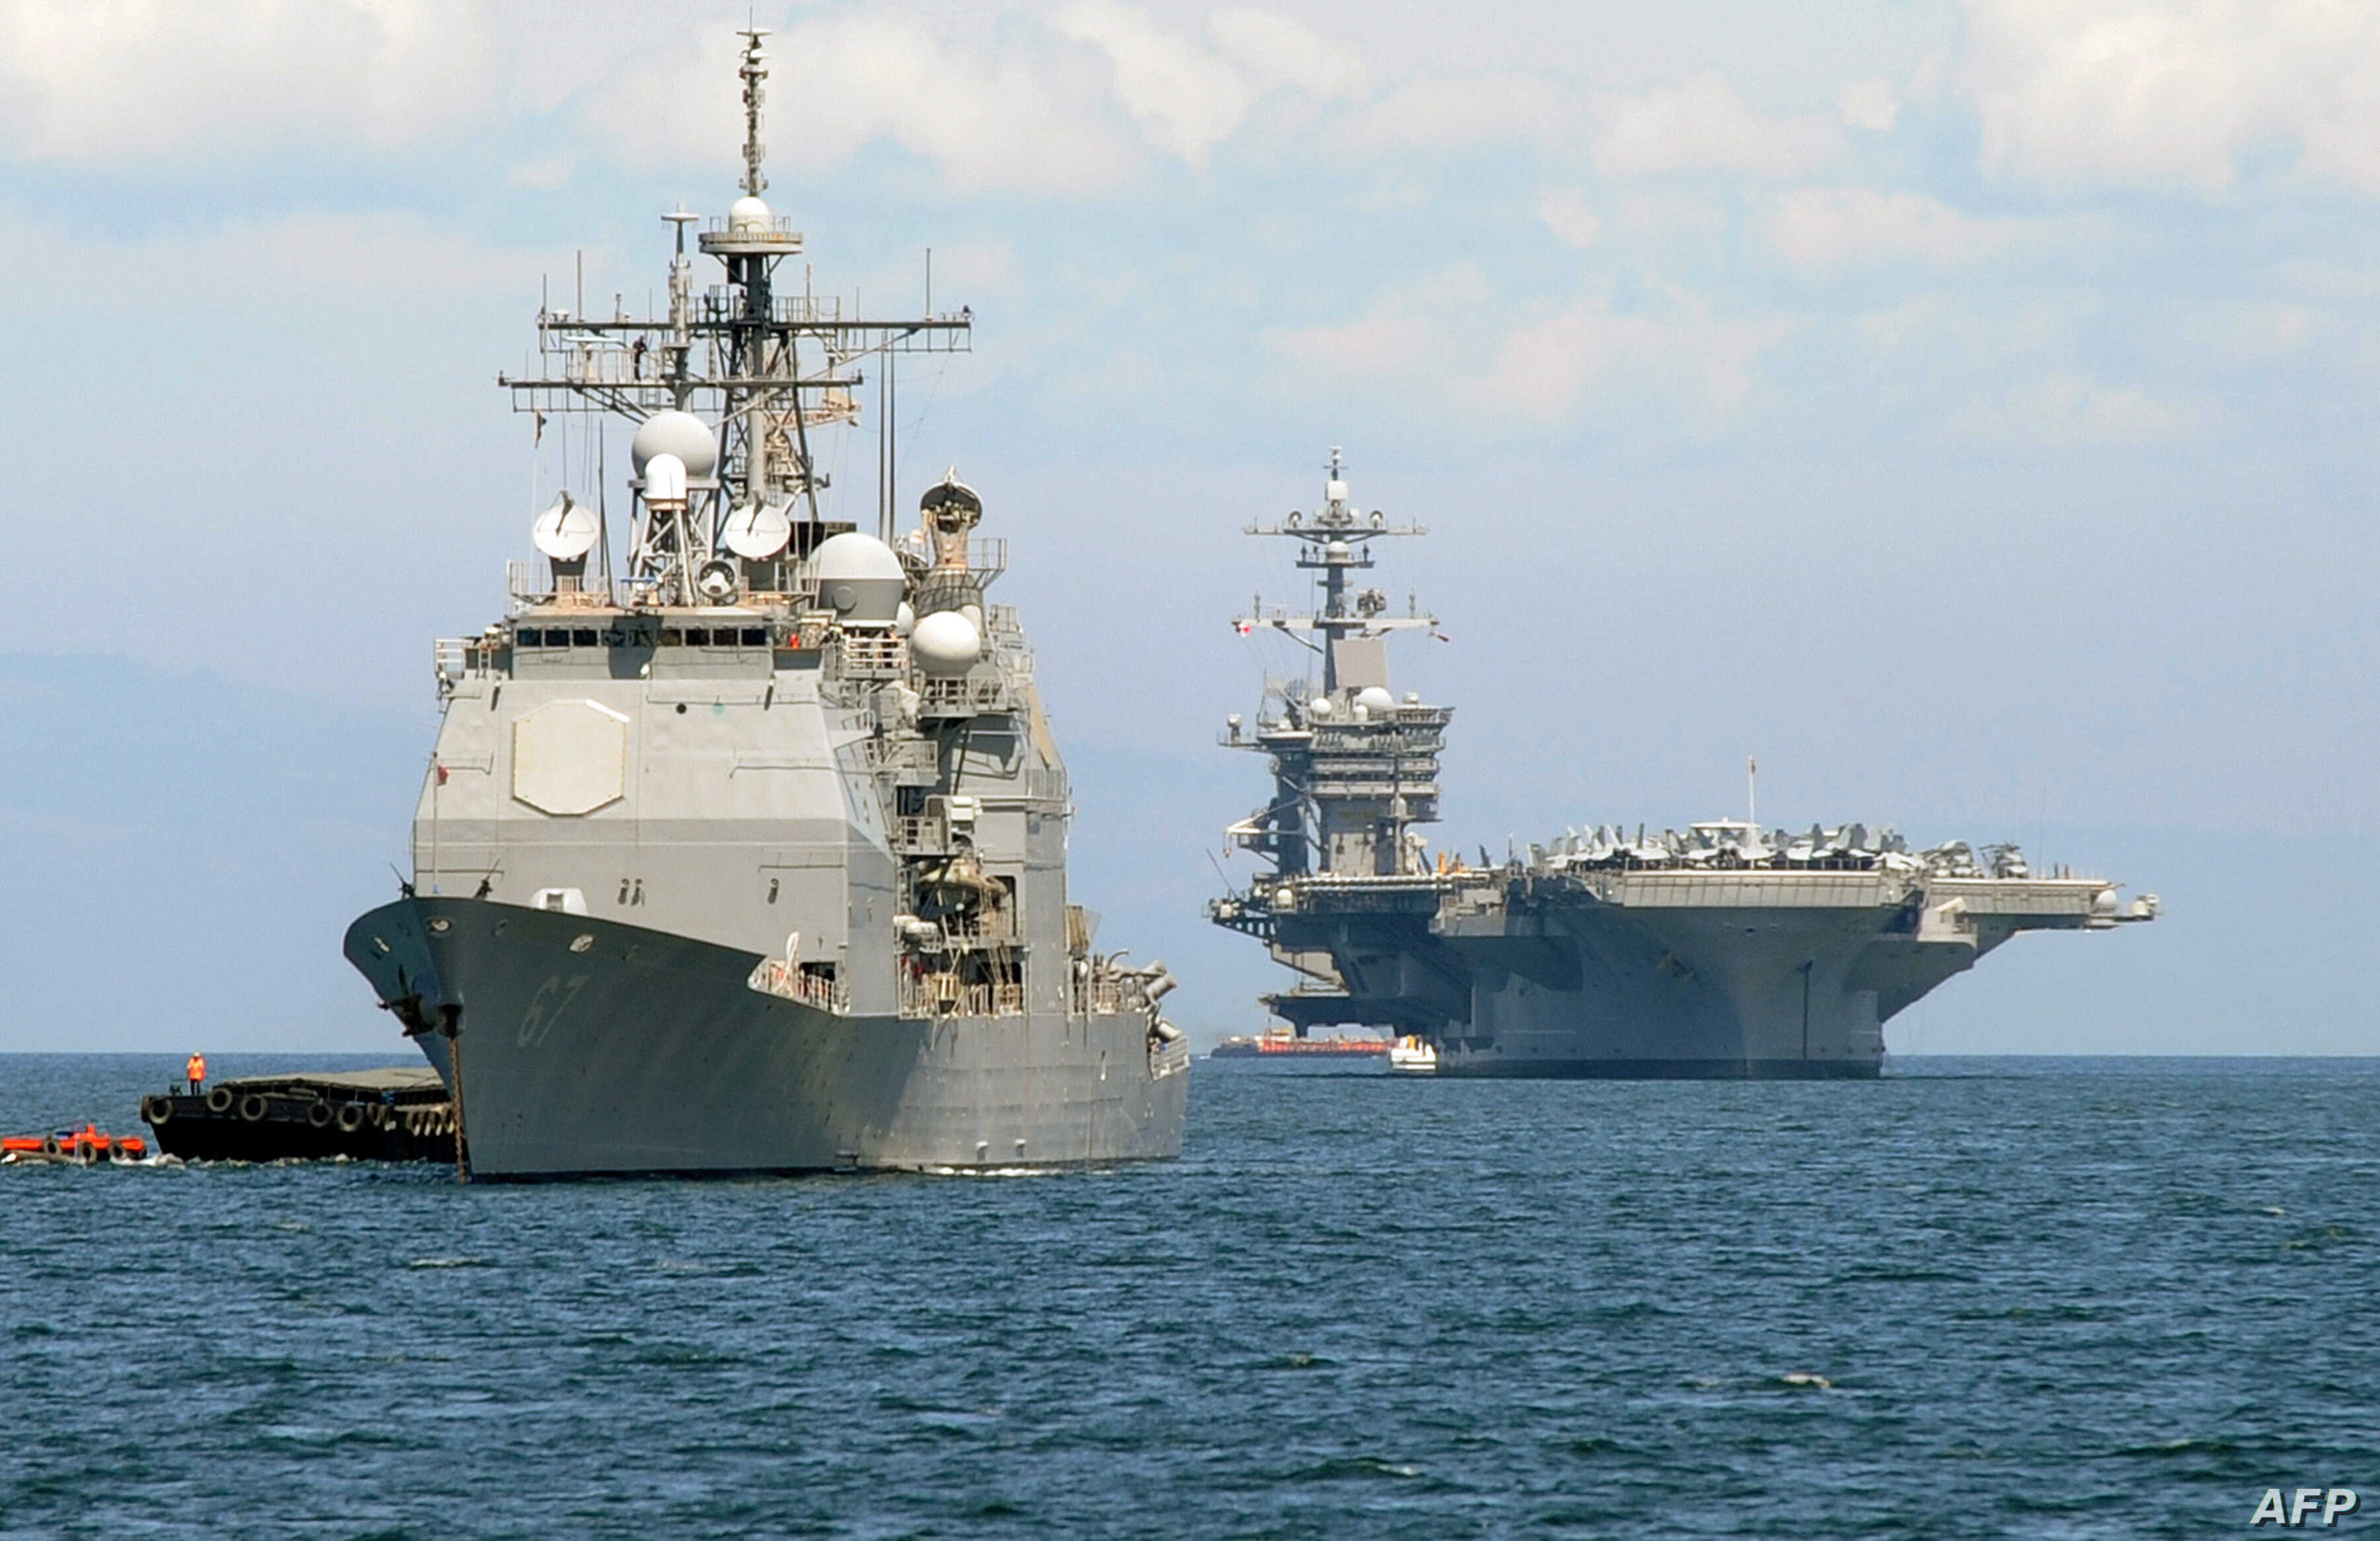 US, China Step Up Activities in South China Sea Amid COVID-19 Pandemic